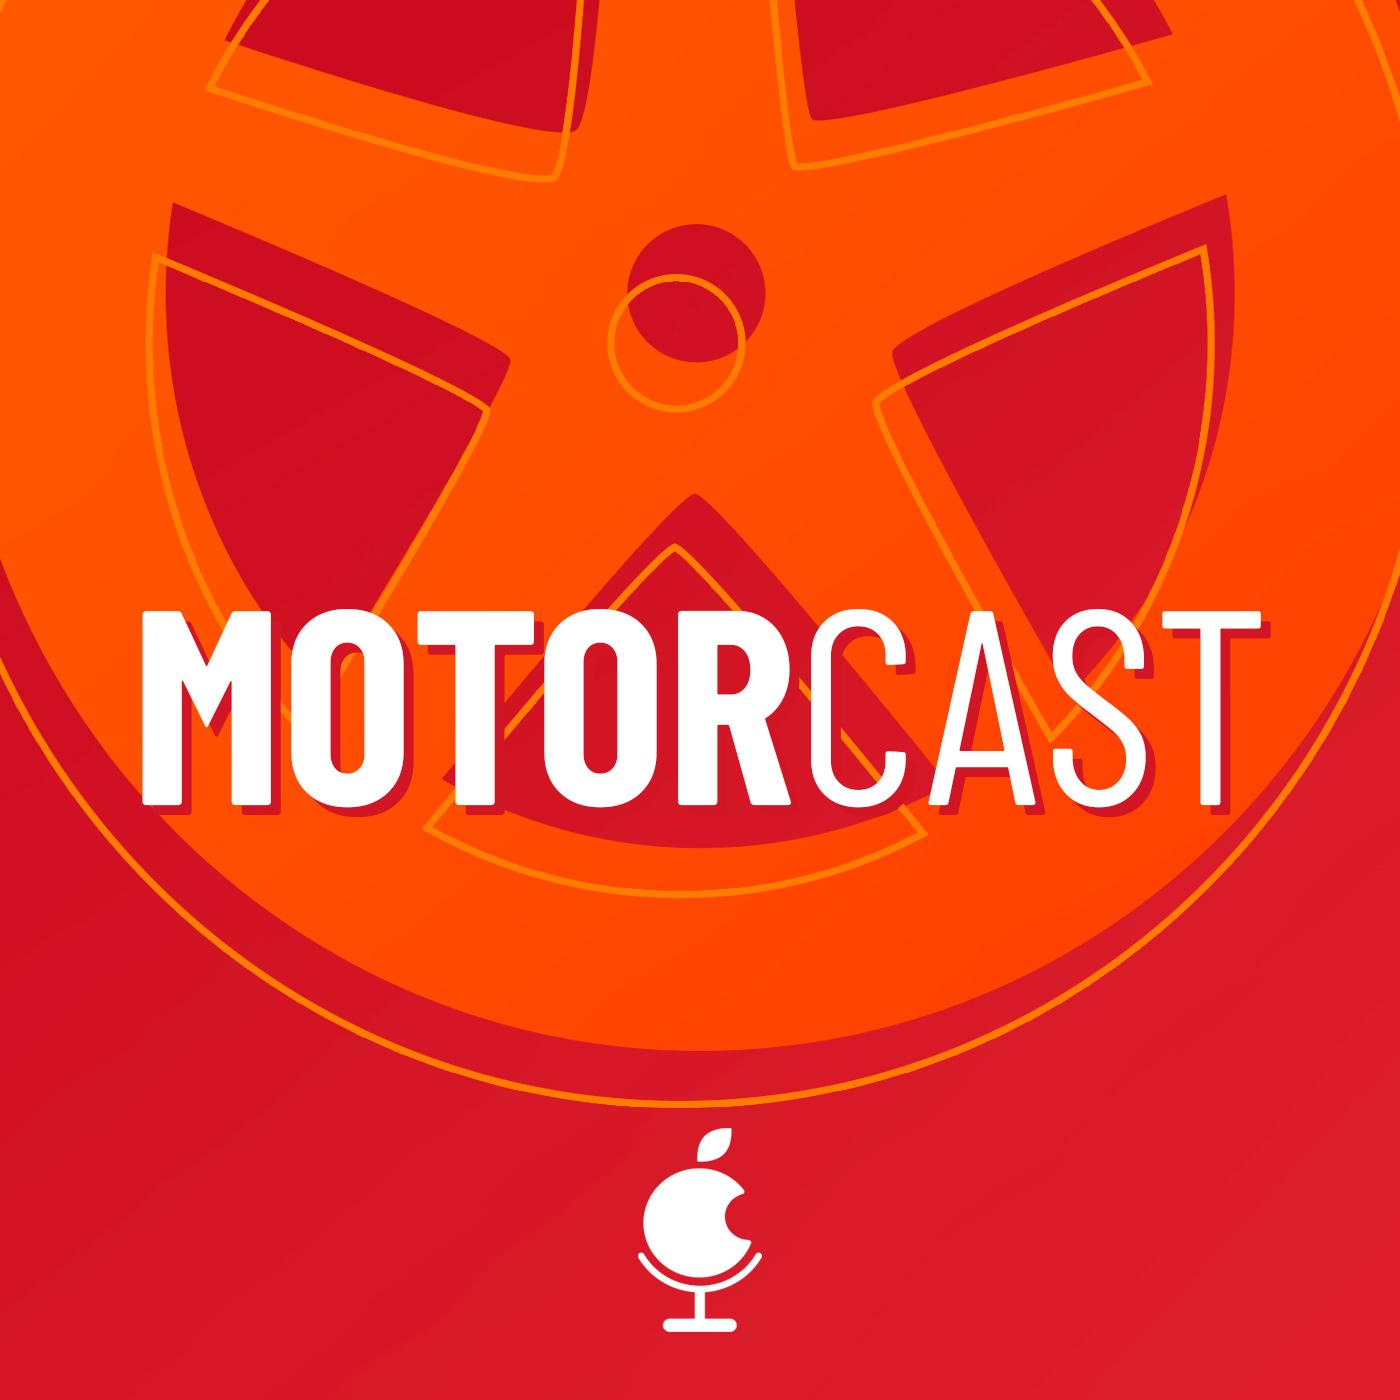 Motorcast